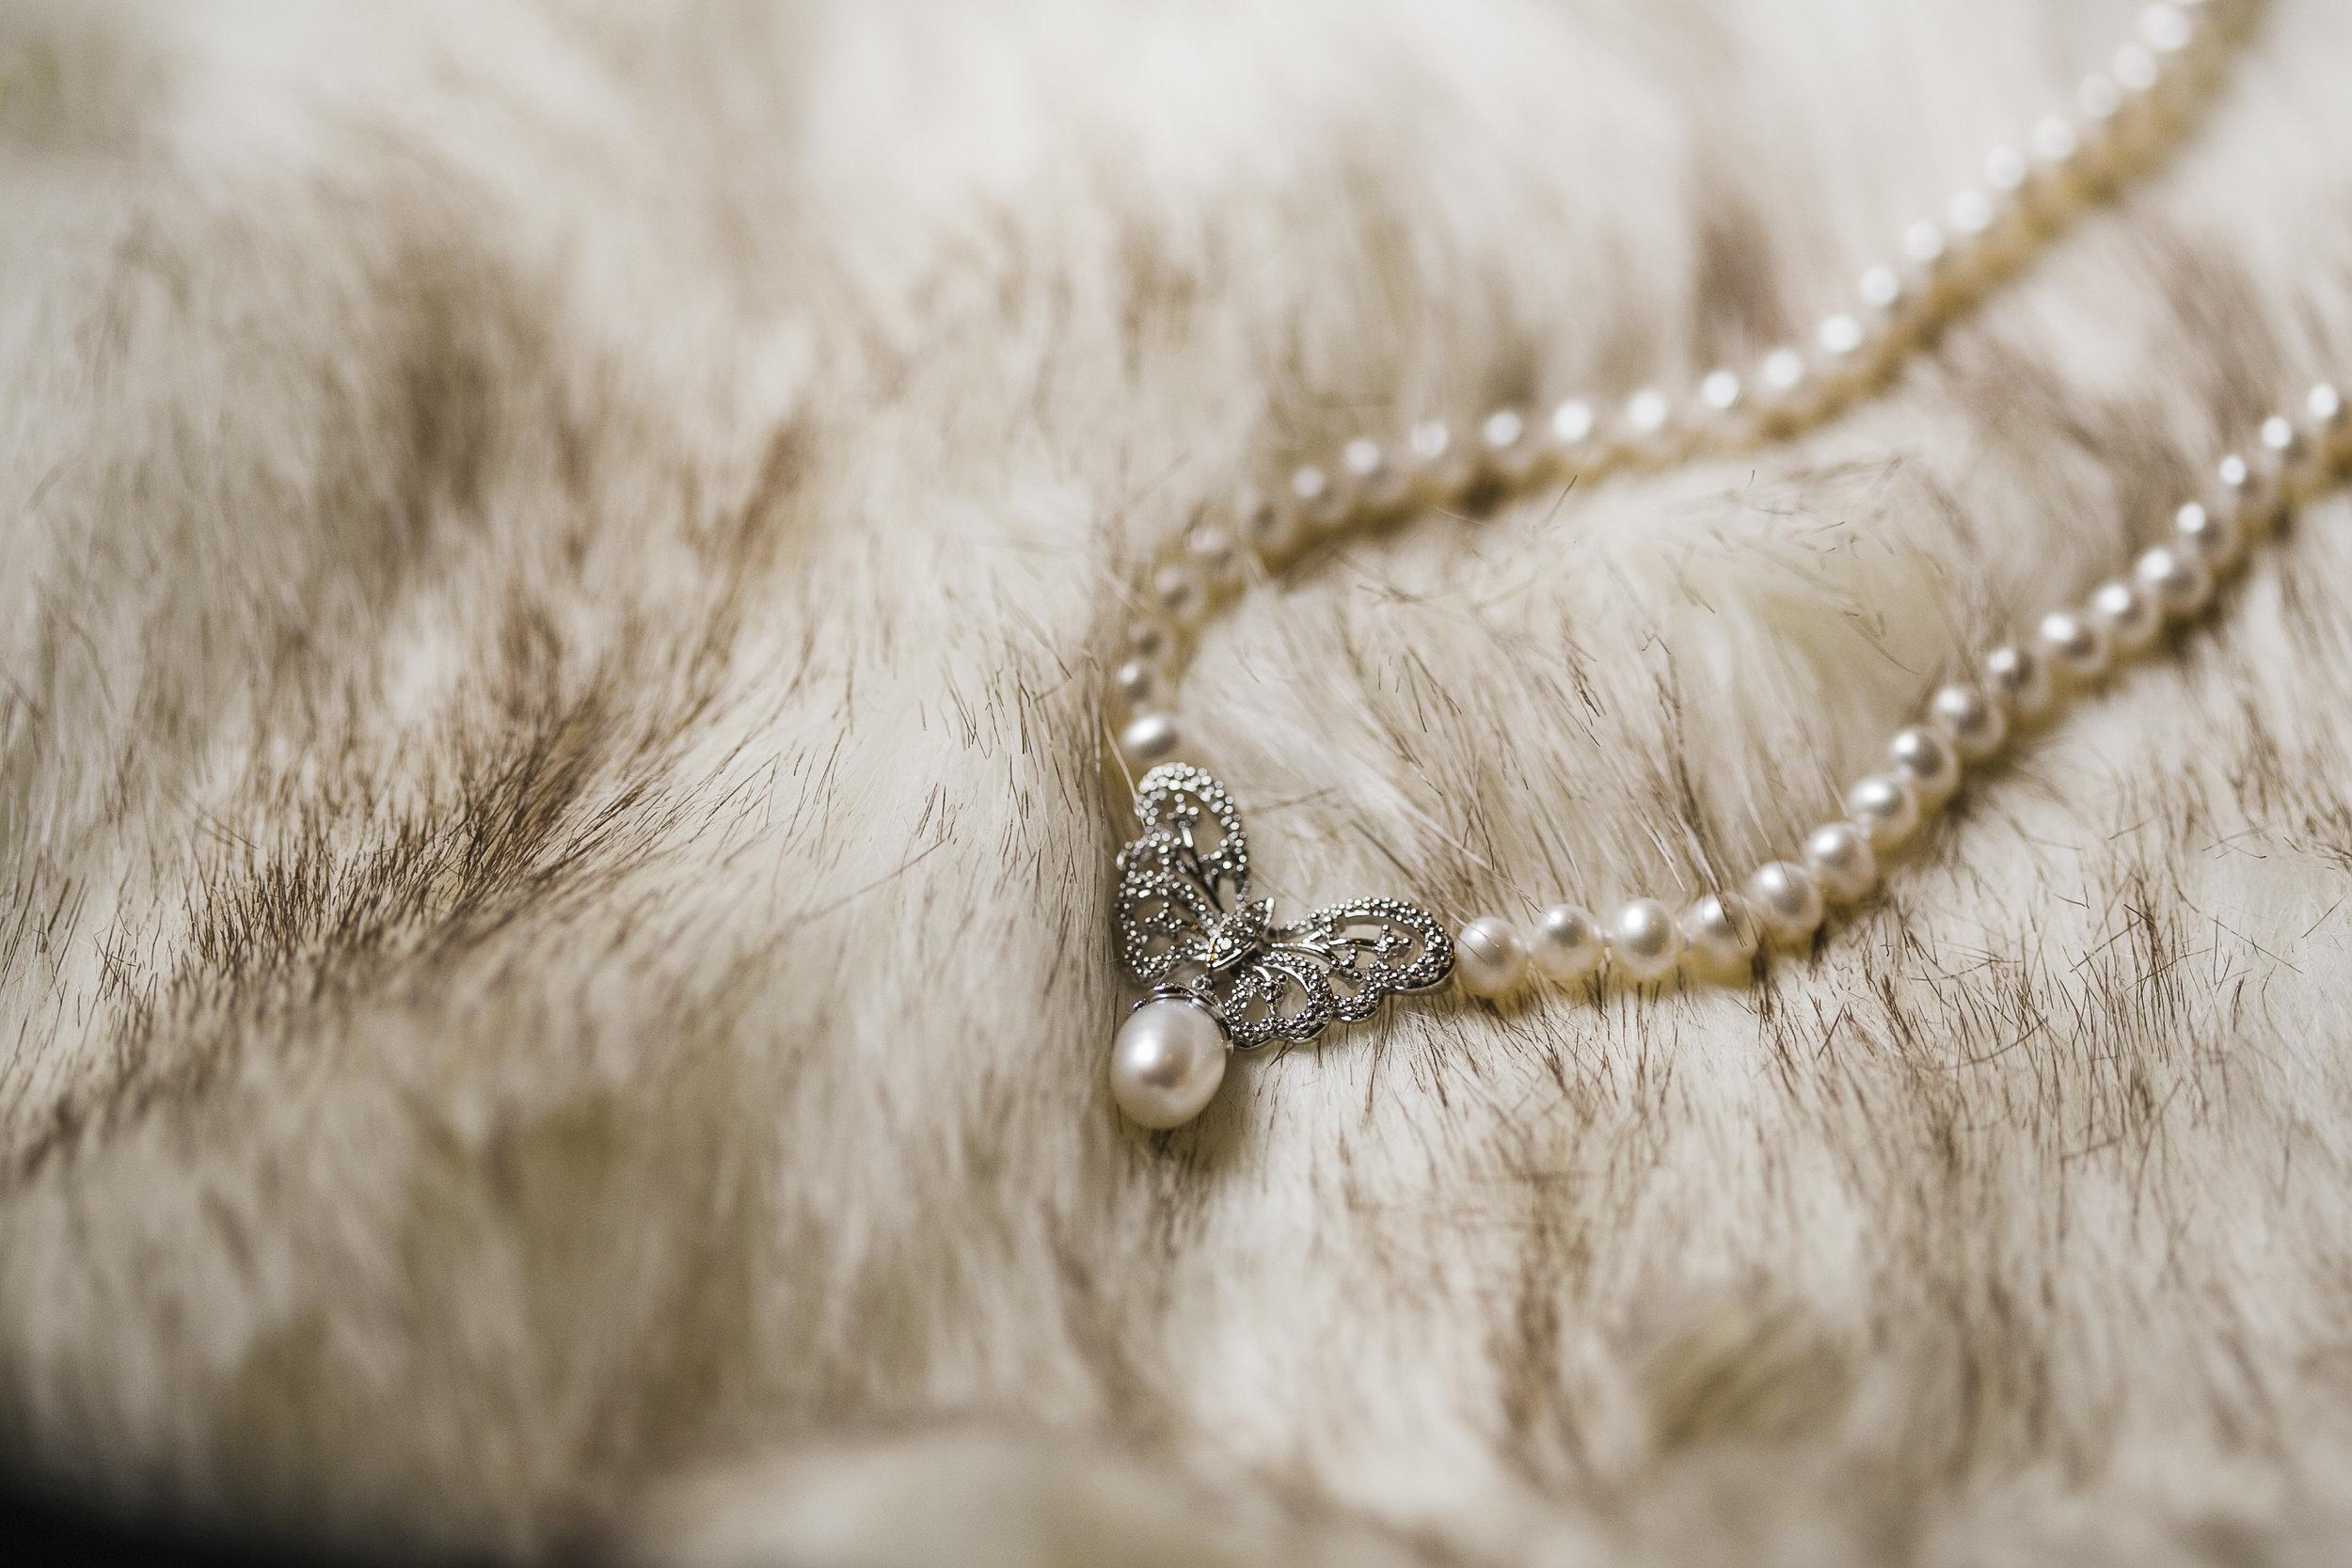 heirloom necklace on fur